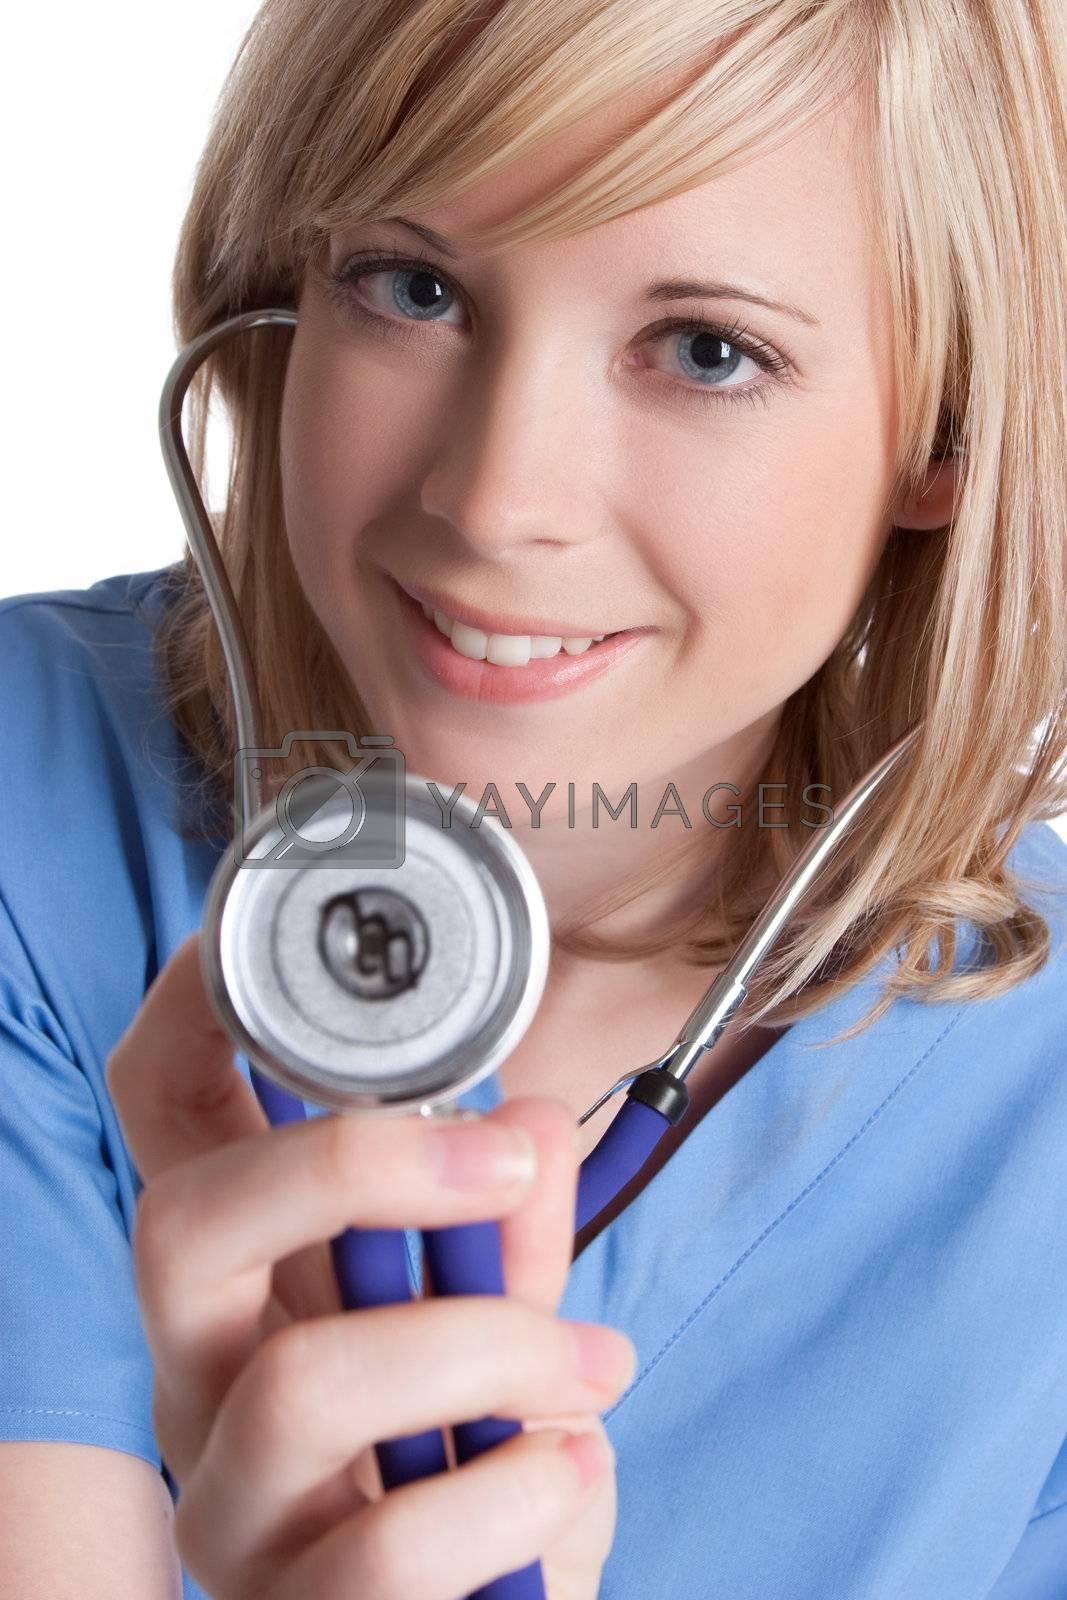 Smiling pretty nurse holding stethoscope